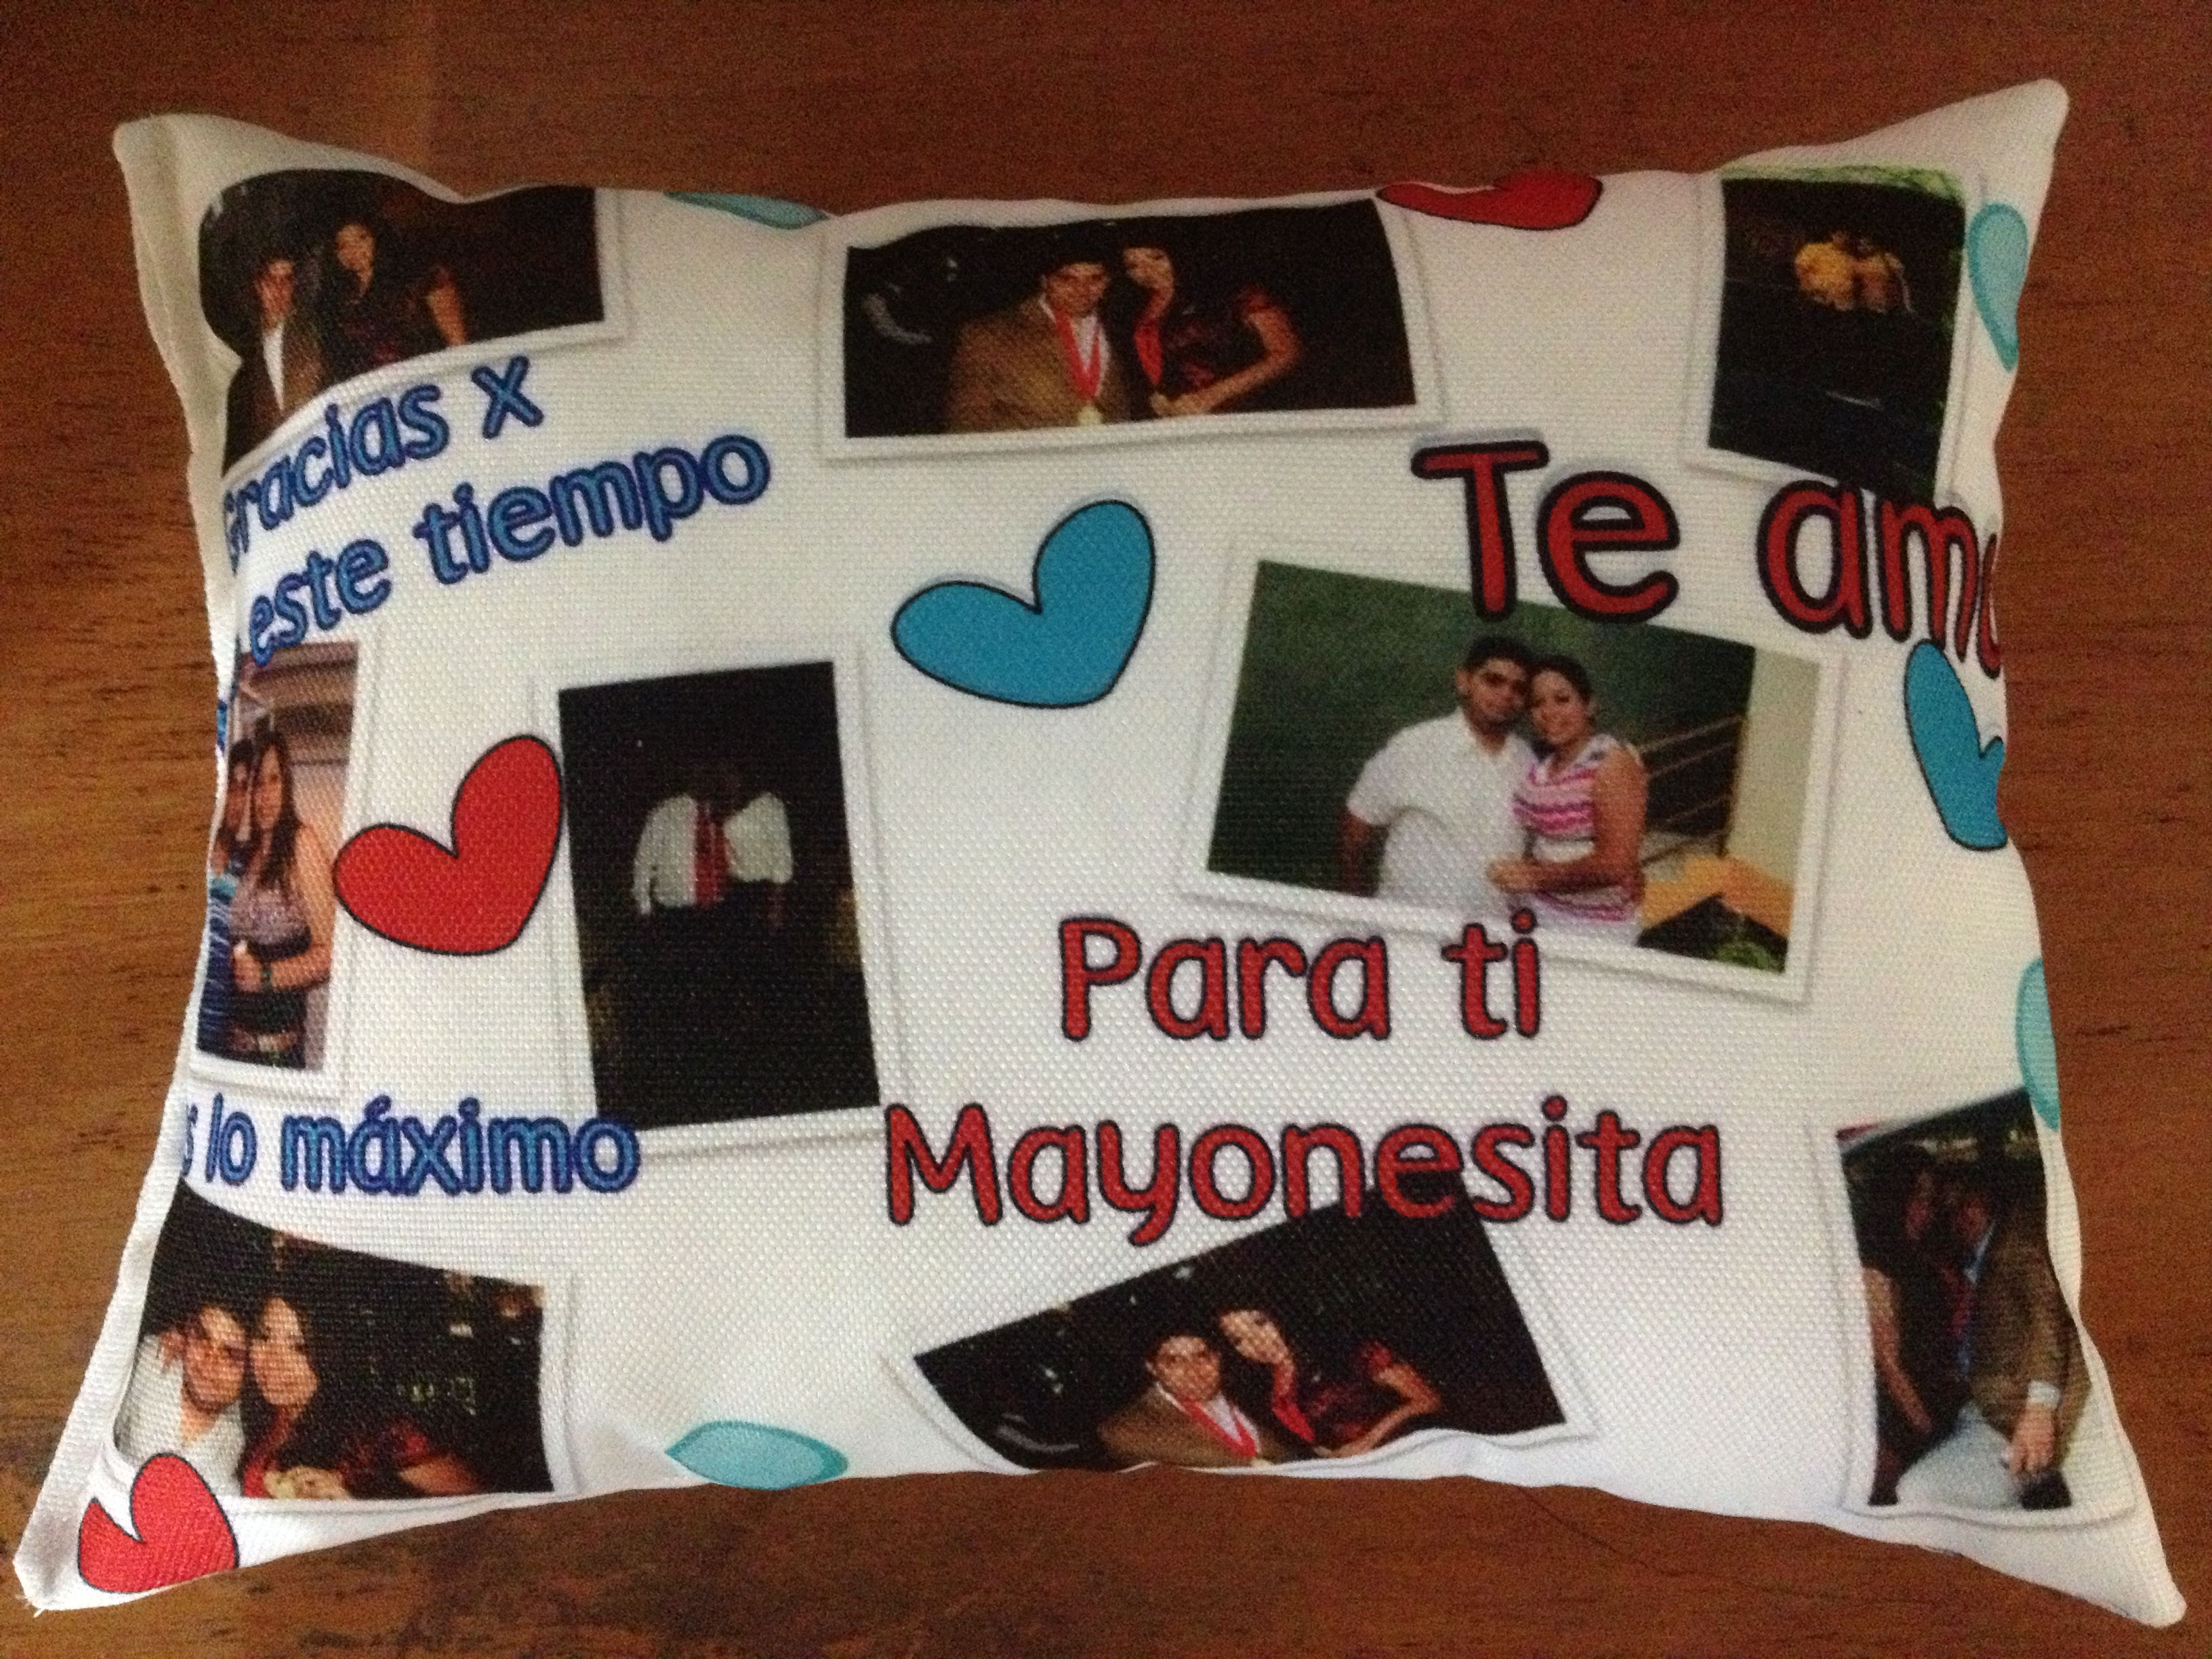 #cojin #personalizado #niño #boy #niña #girl #kids #baby  Para información o pedidos contáctenos por:   Email: info@merynell.com PIN 21A6B087  Telefono: 0424.543.32.32  Twitter: @mery_nell  Instagram: @mery_nell  Pinterest: www.pinterest.com/decomerynell Facebook: http://www.facebook.com/decoracionesmerynell Sitio Web: http://www.merynell.com/